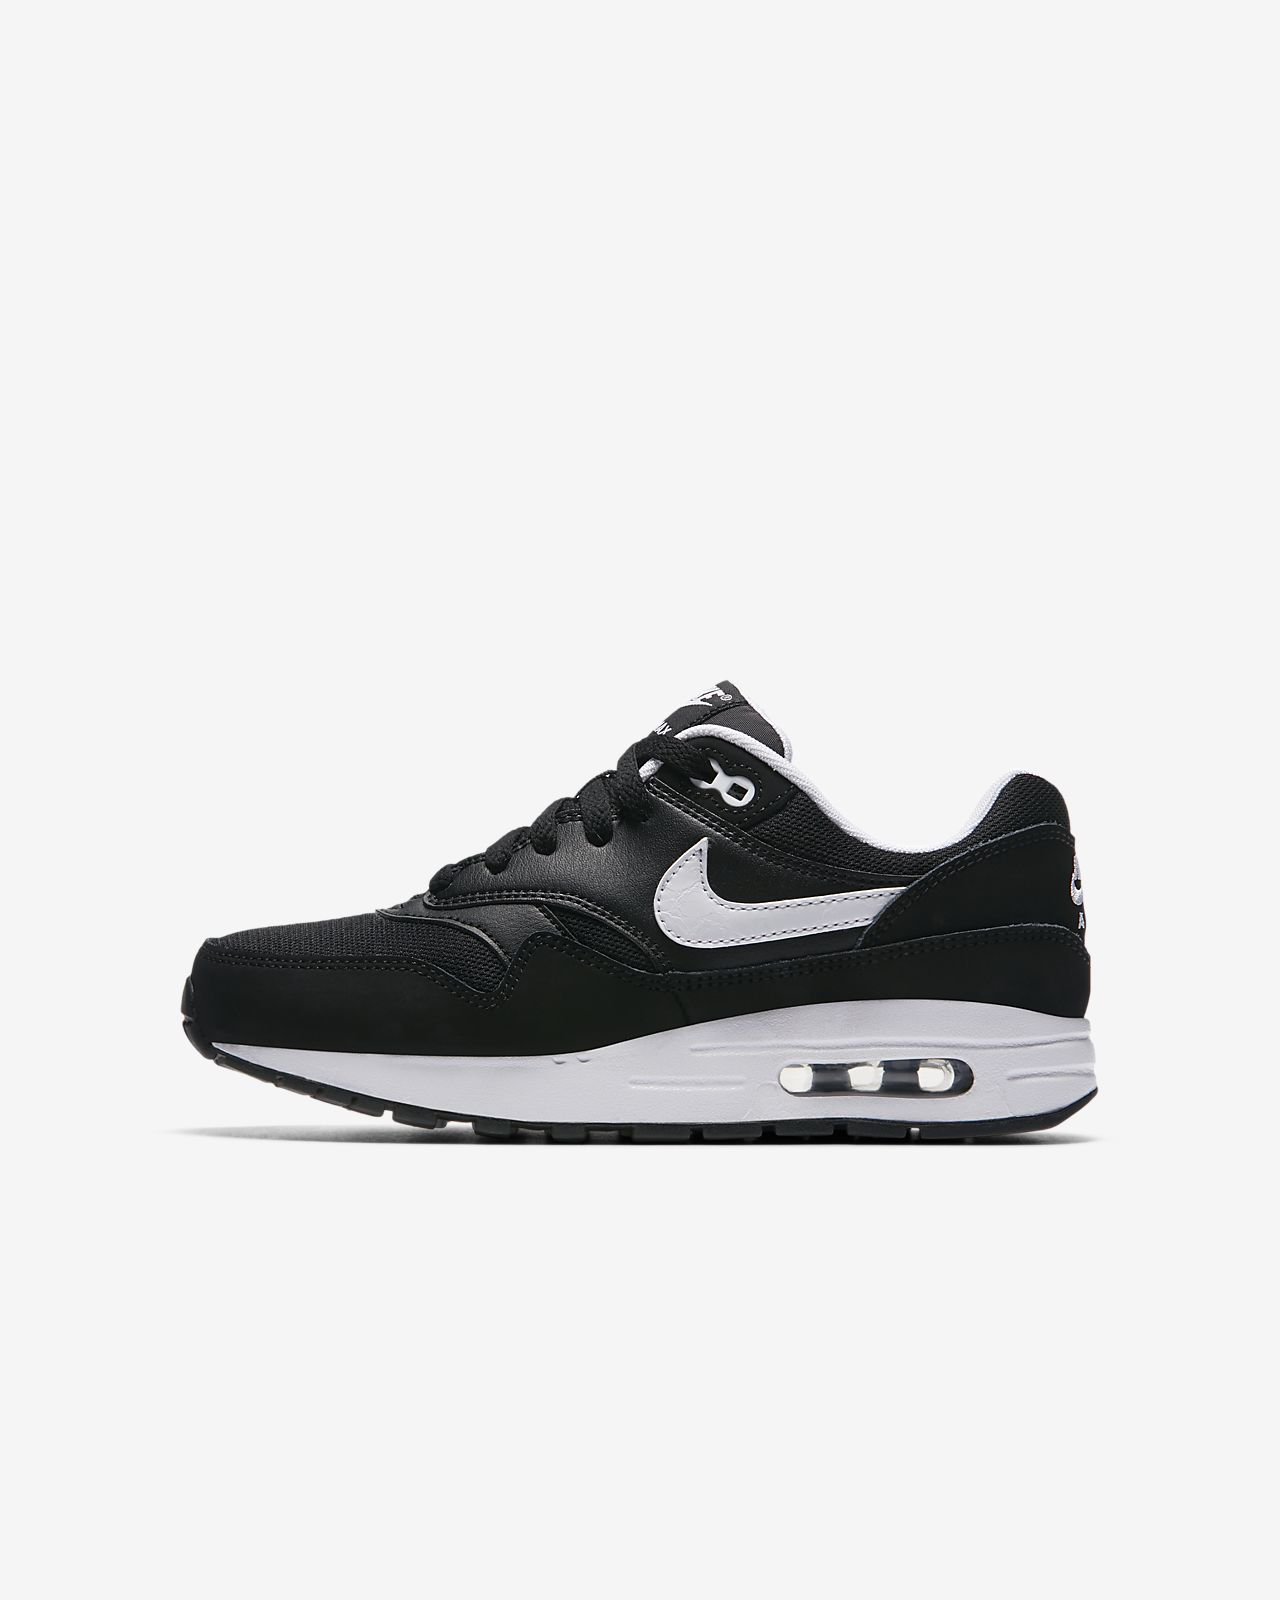 online store ada46 fdb98 ... Nike Air Max 1 Older Kids  Shoe